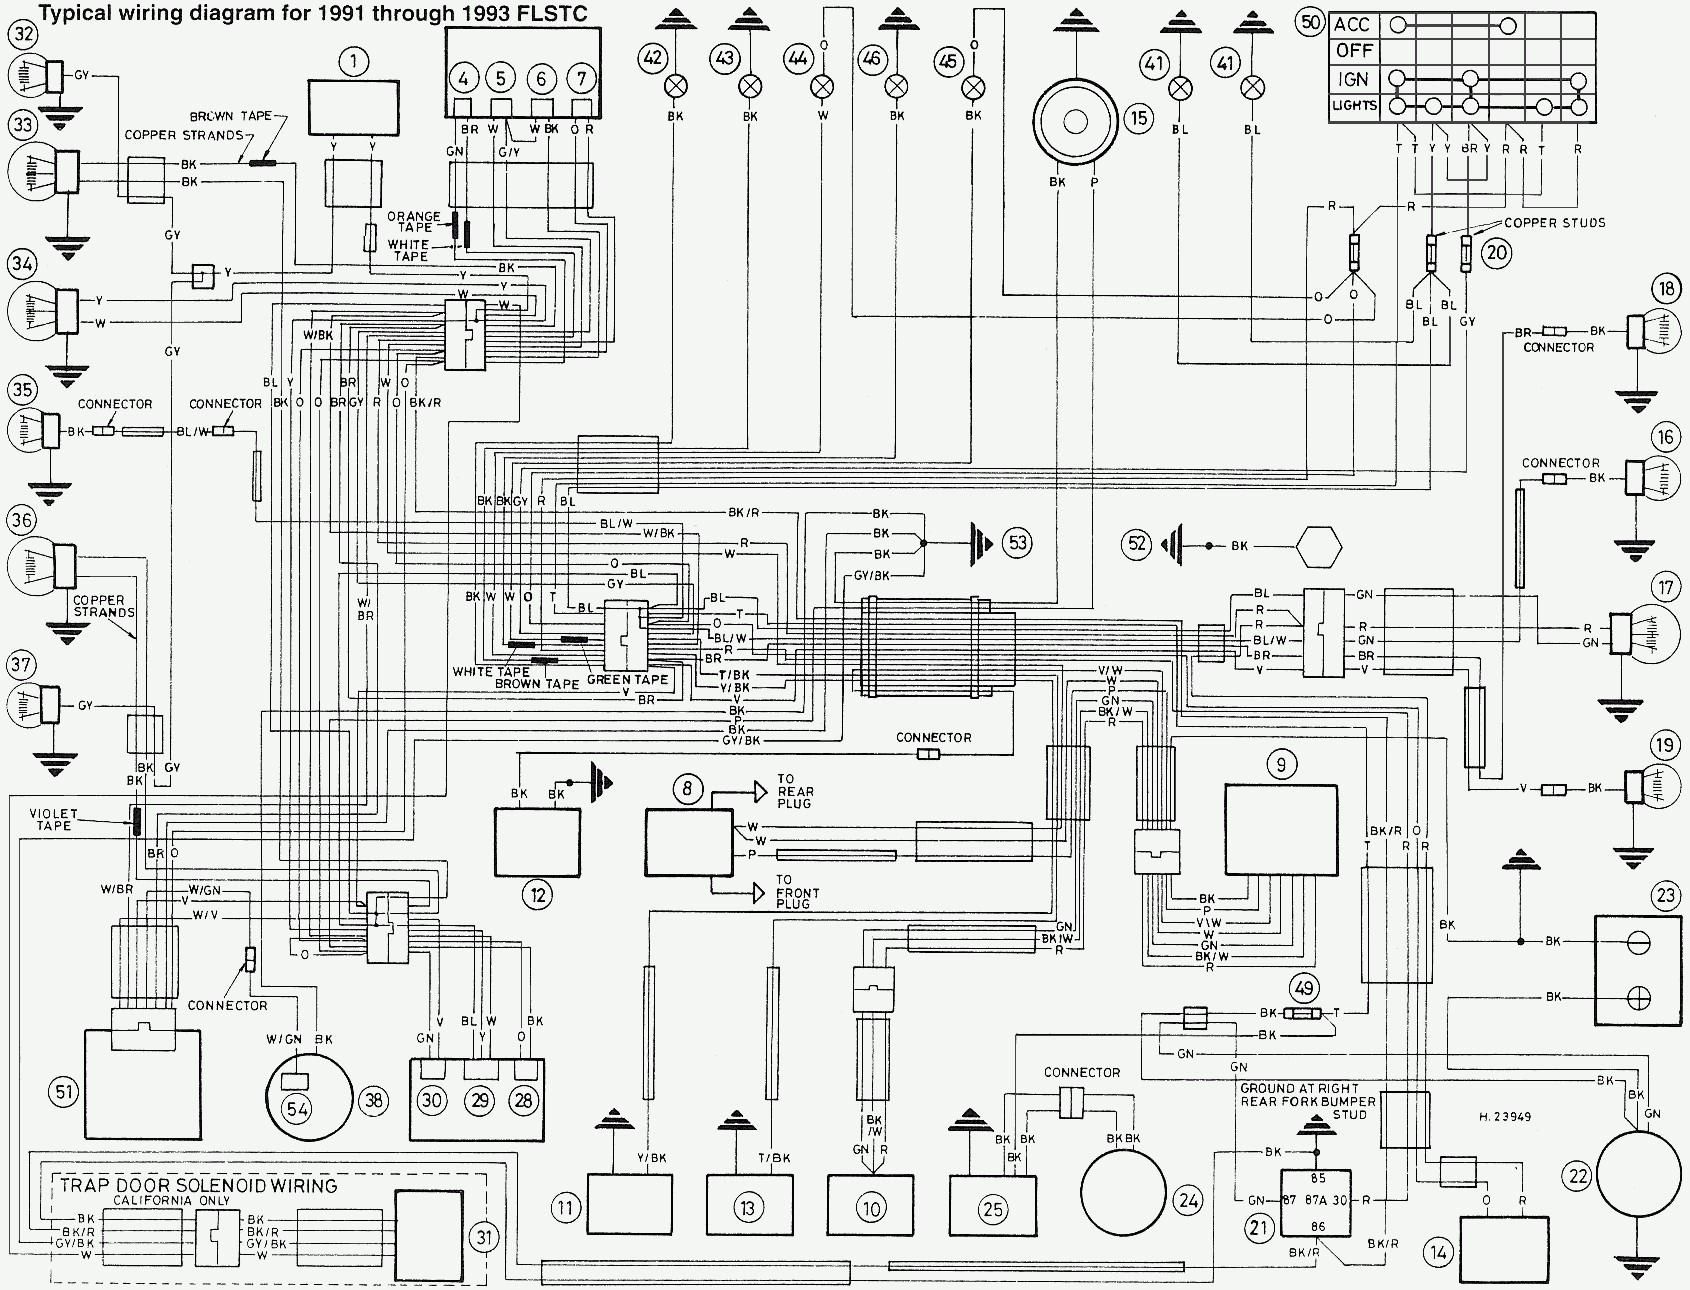 harley davidson fxst wiring diagram wiring diagram directory Harley Davidson Electric Starter